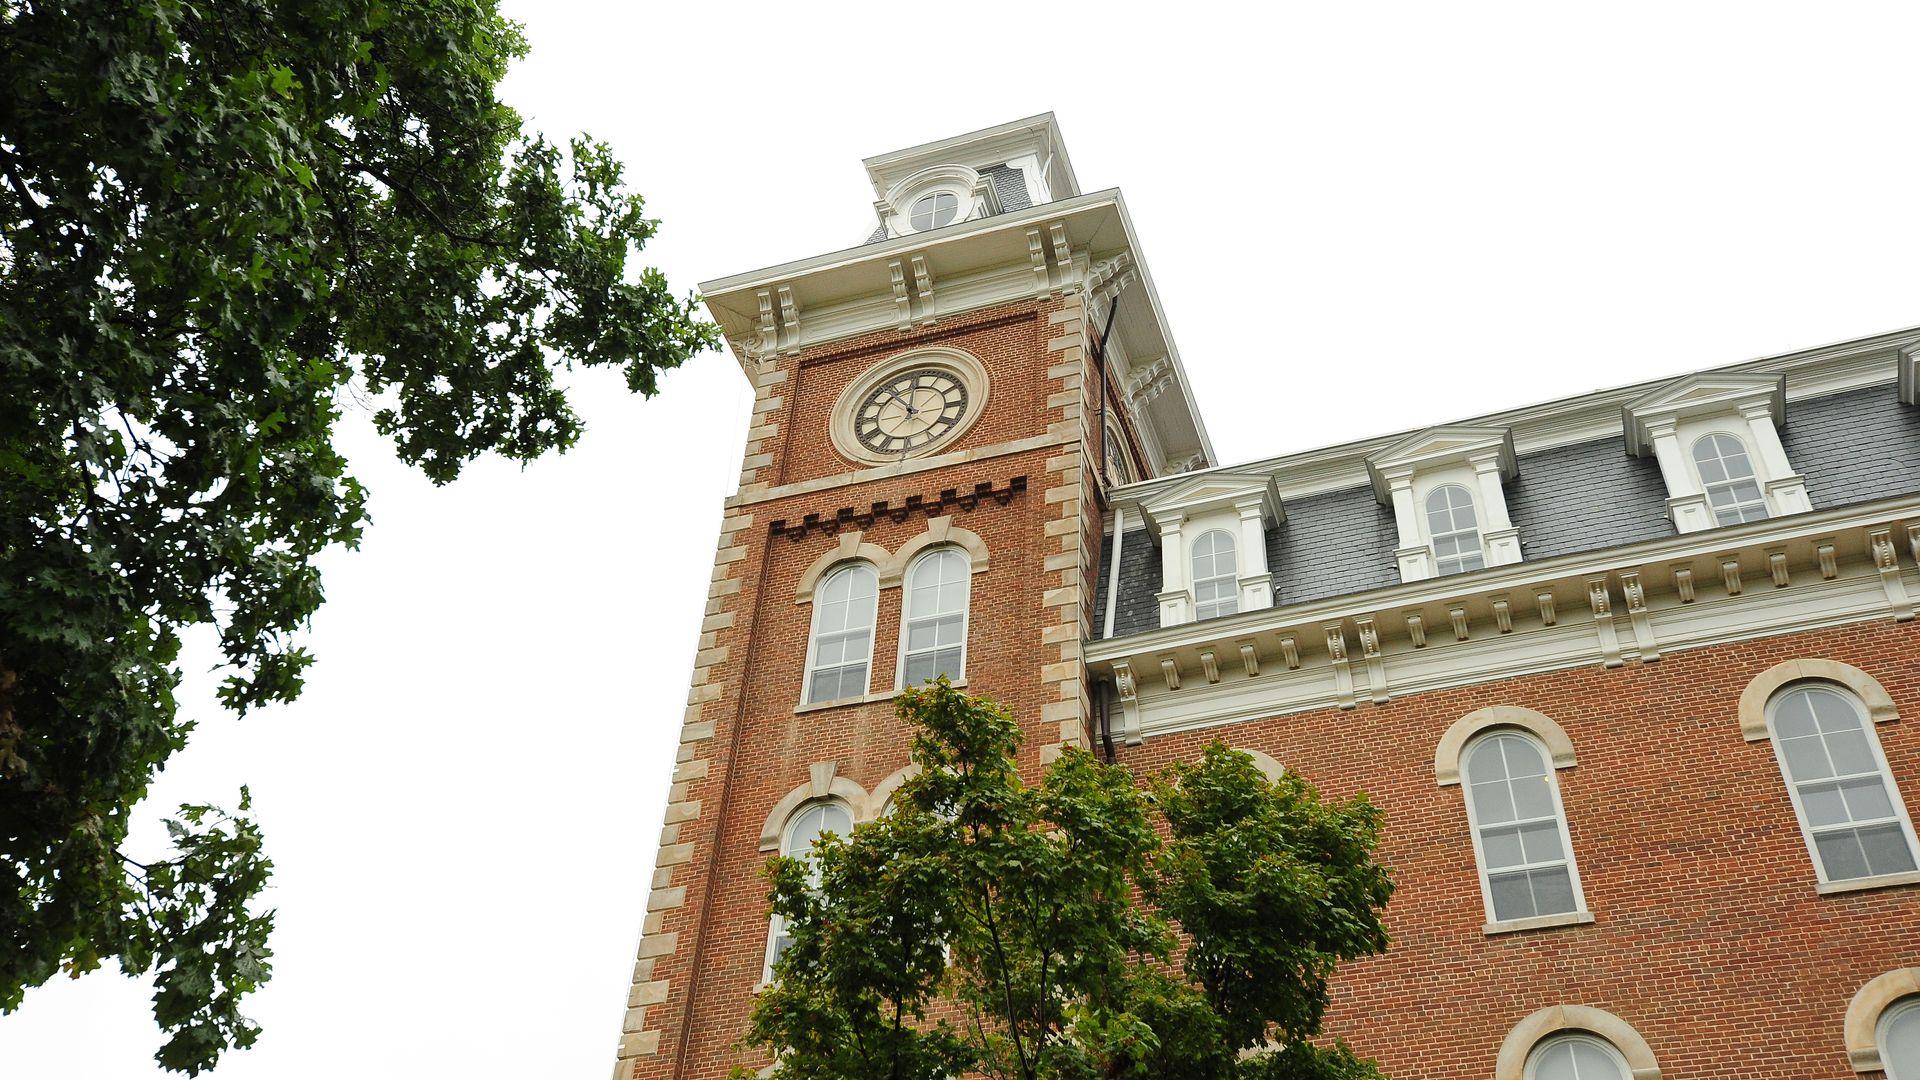 photo of Old Main at U of A campus